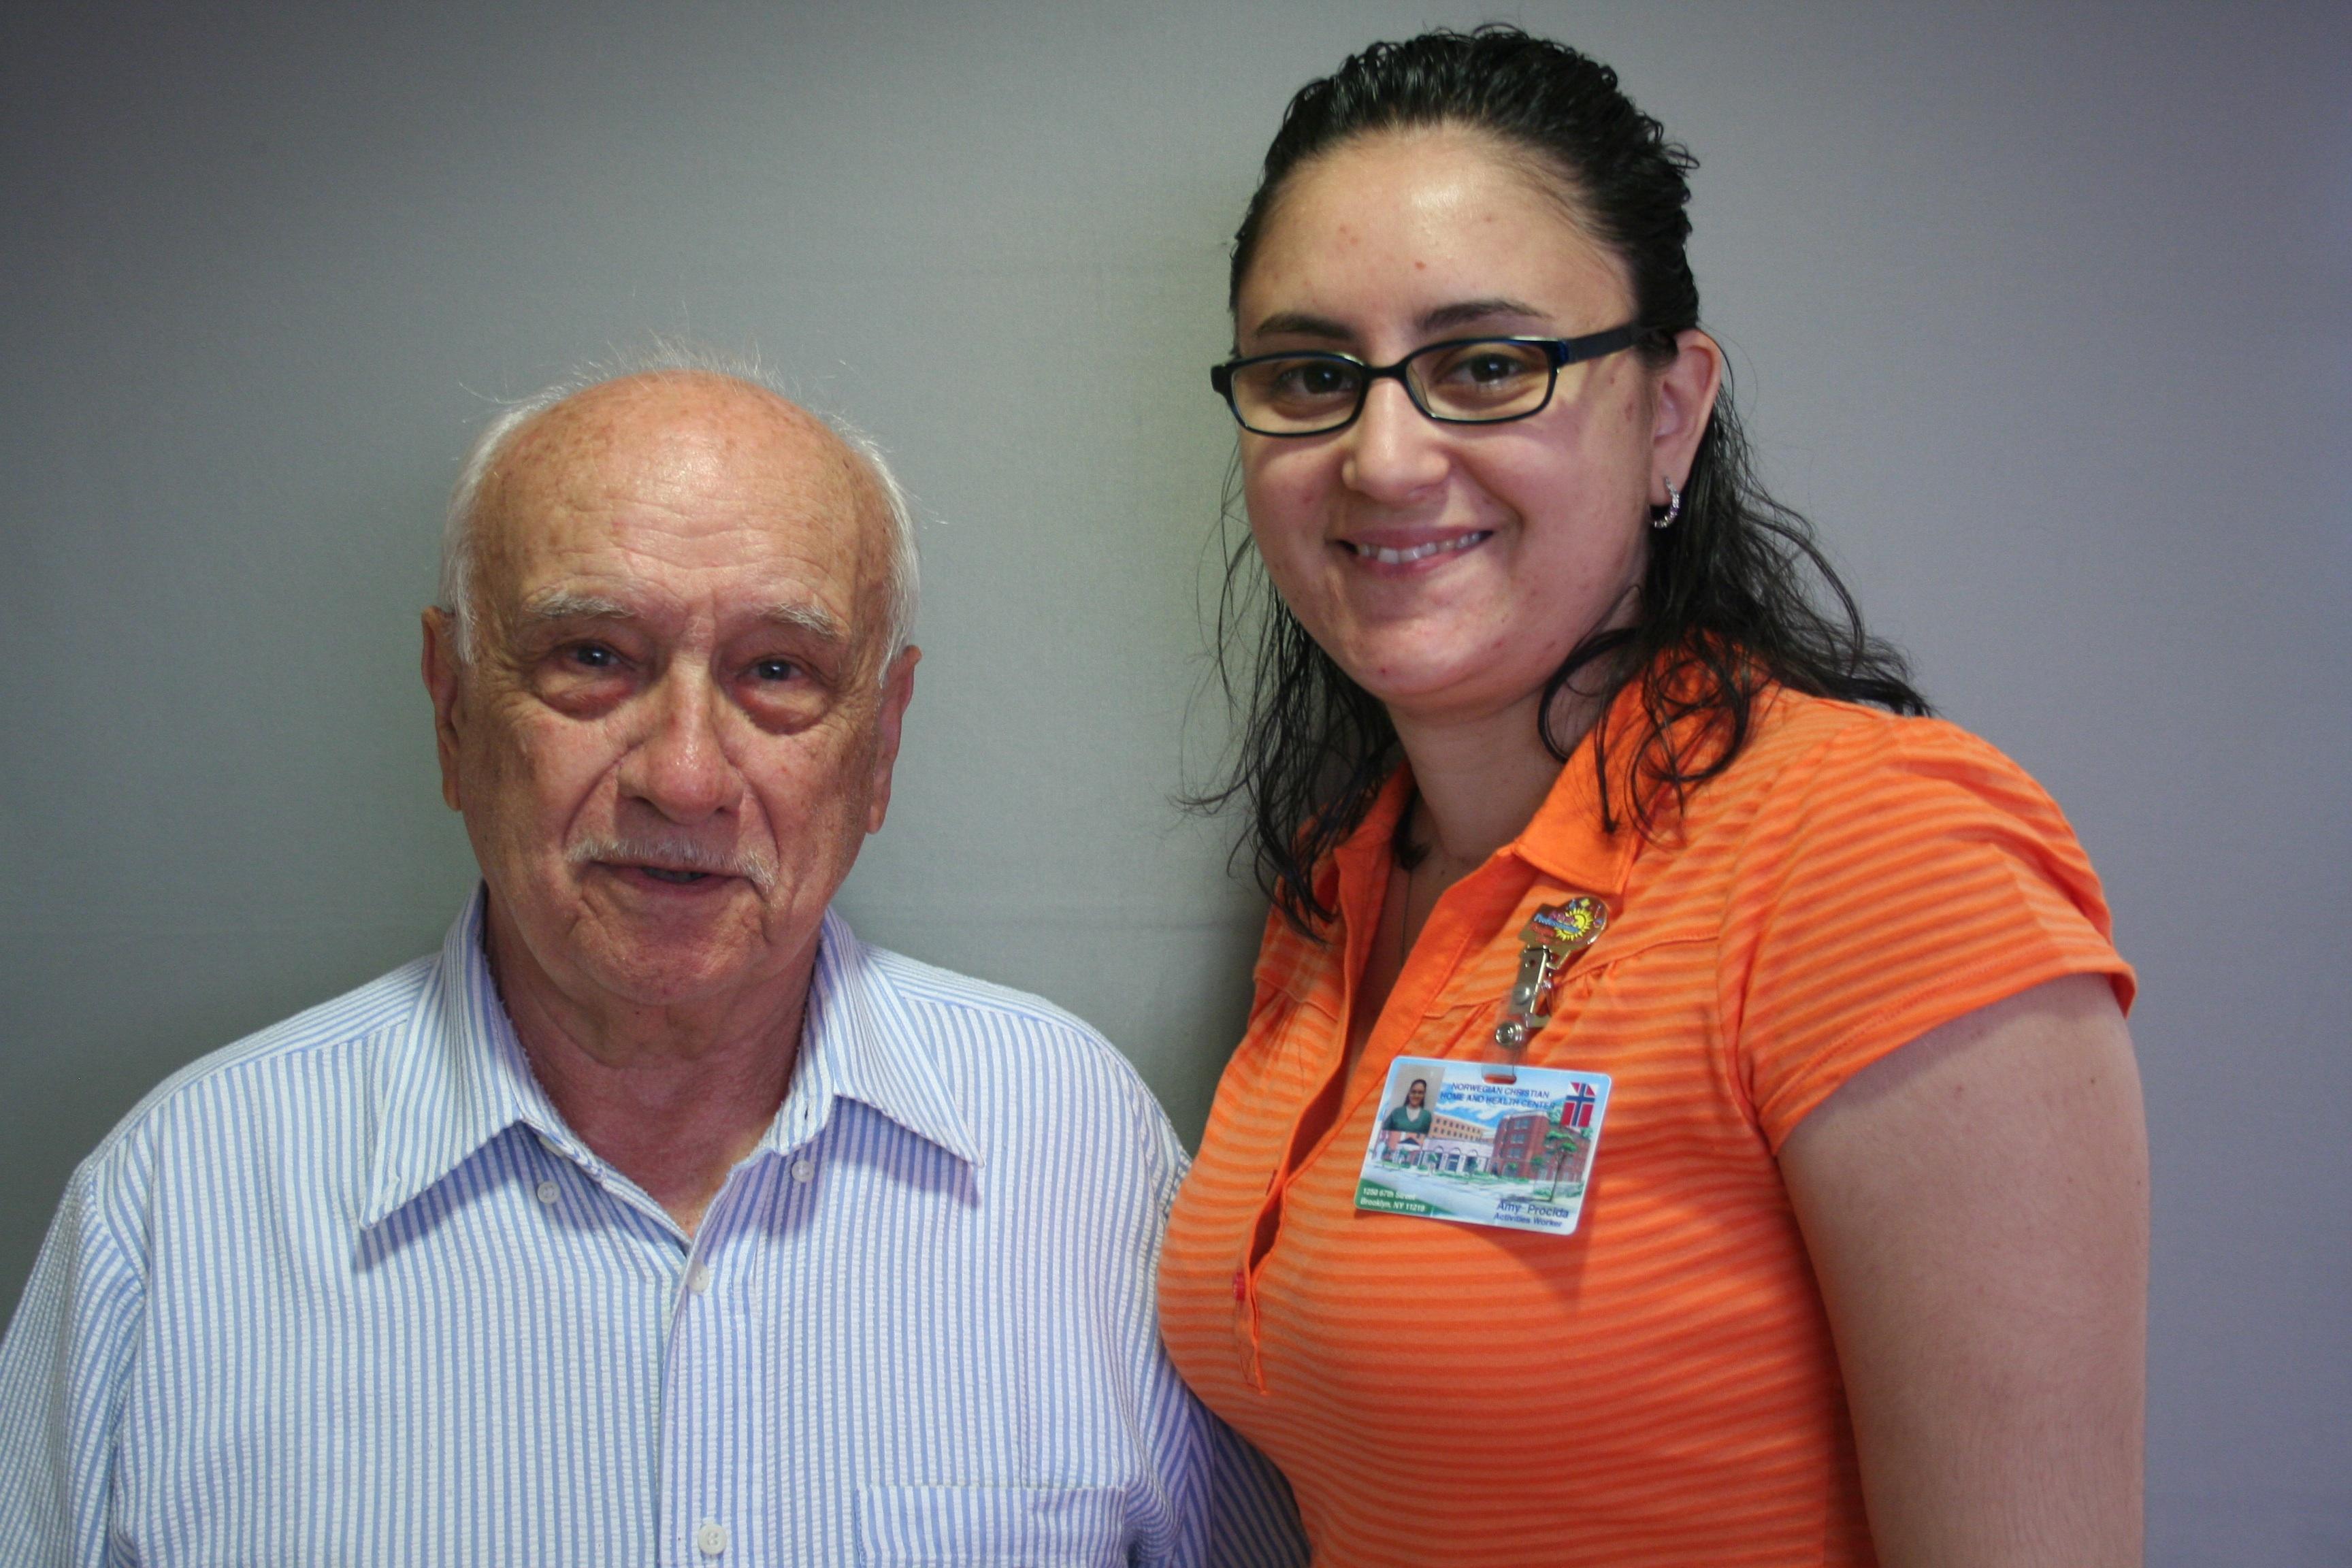 StoryCorps: Anthony Fabietti & Amy Christodoulou